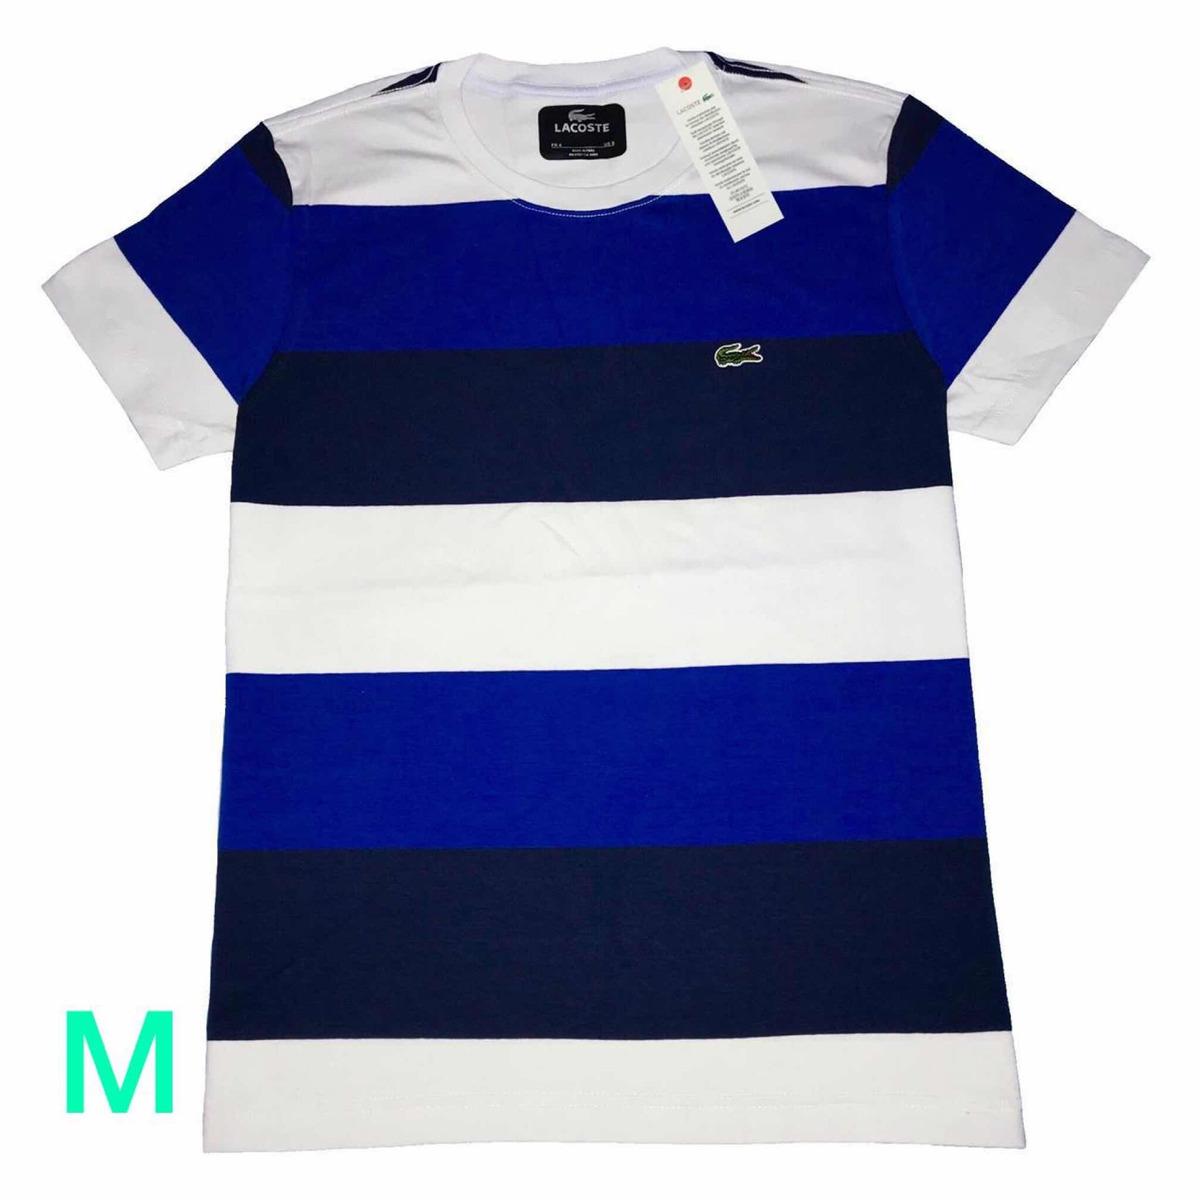 1c053fa65b9 camiseta lacoste listrada peruana 100% original. Carregando zoom.